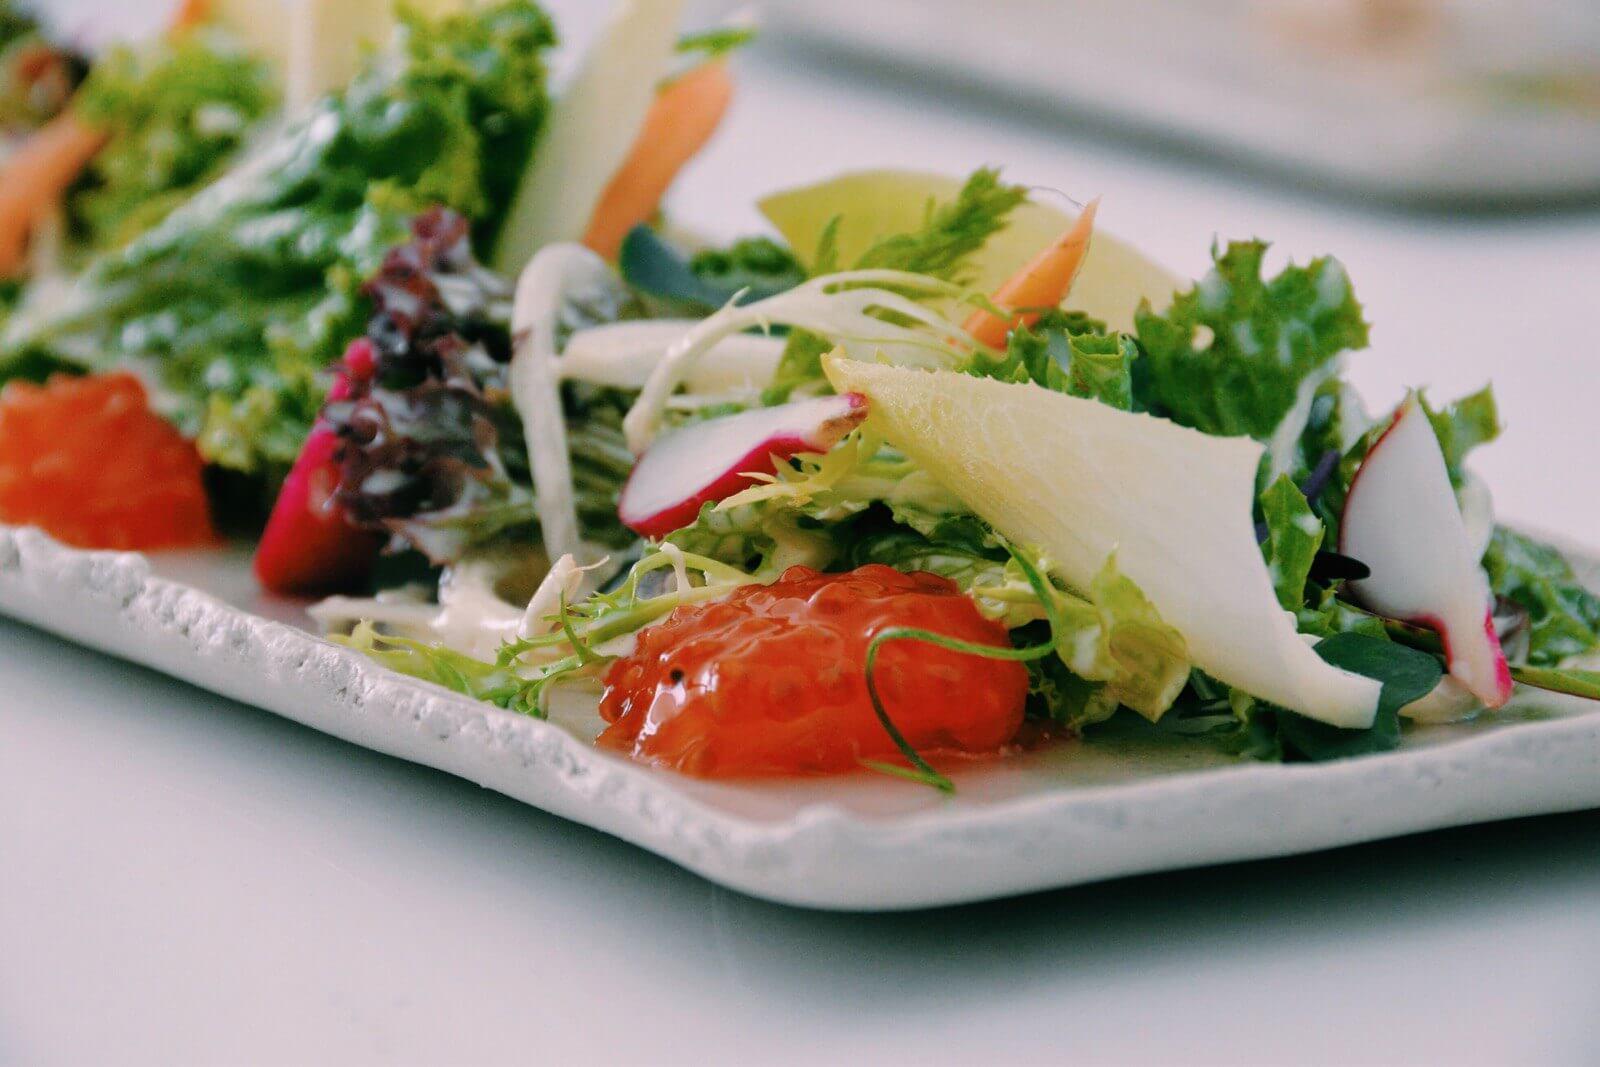 https://www.white-ibiza.com/wp-content/uploads/2020/03/formentera-restaurants-kokoy-2020-03.jpg